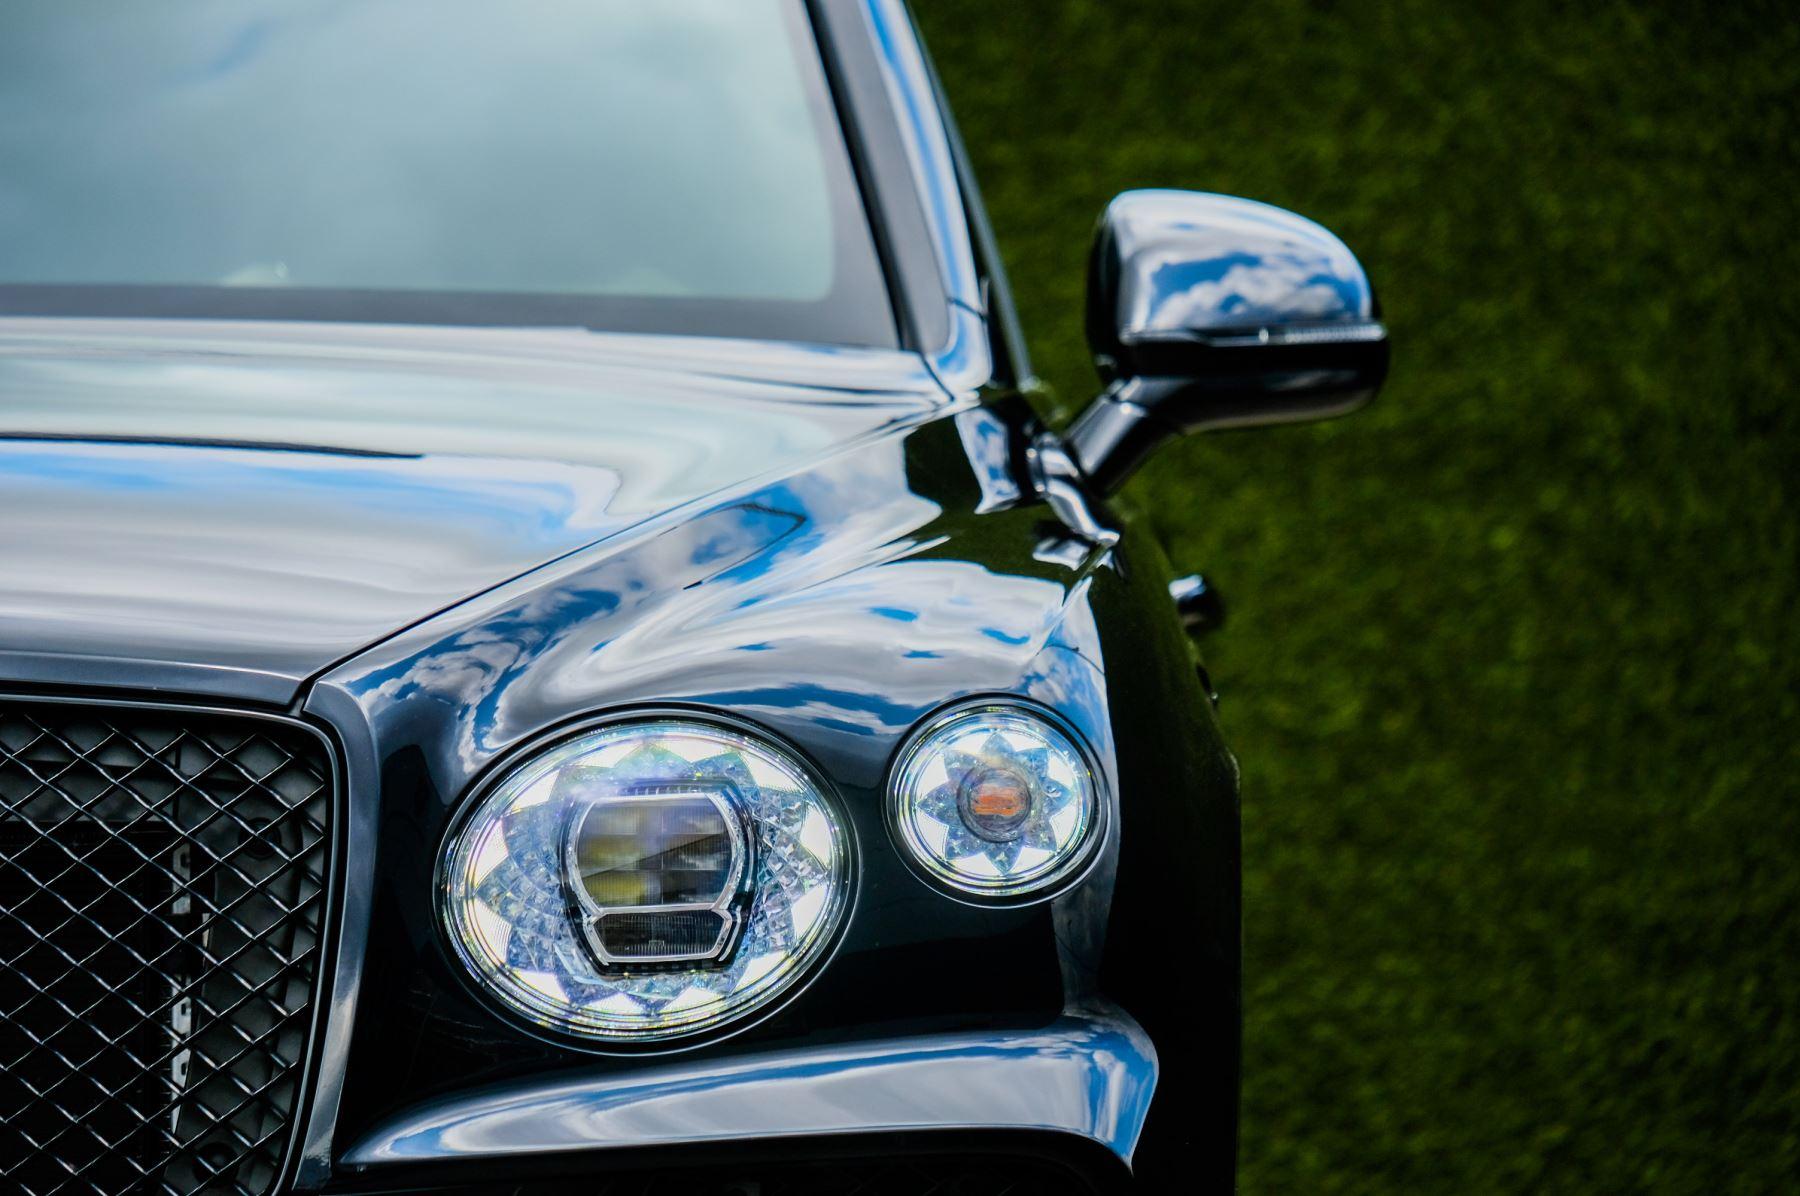 Bentley Bentayga 4.0 V8 - Mulliner Driving Specification for Black Specification image 6